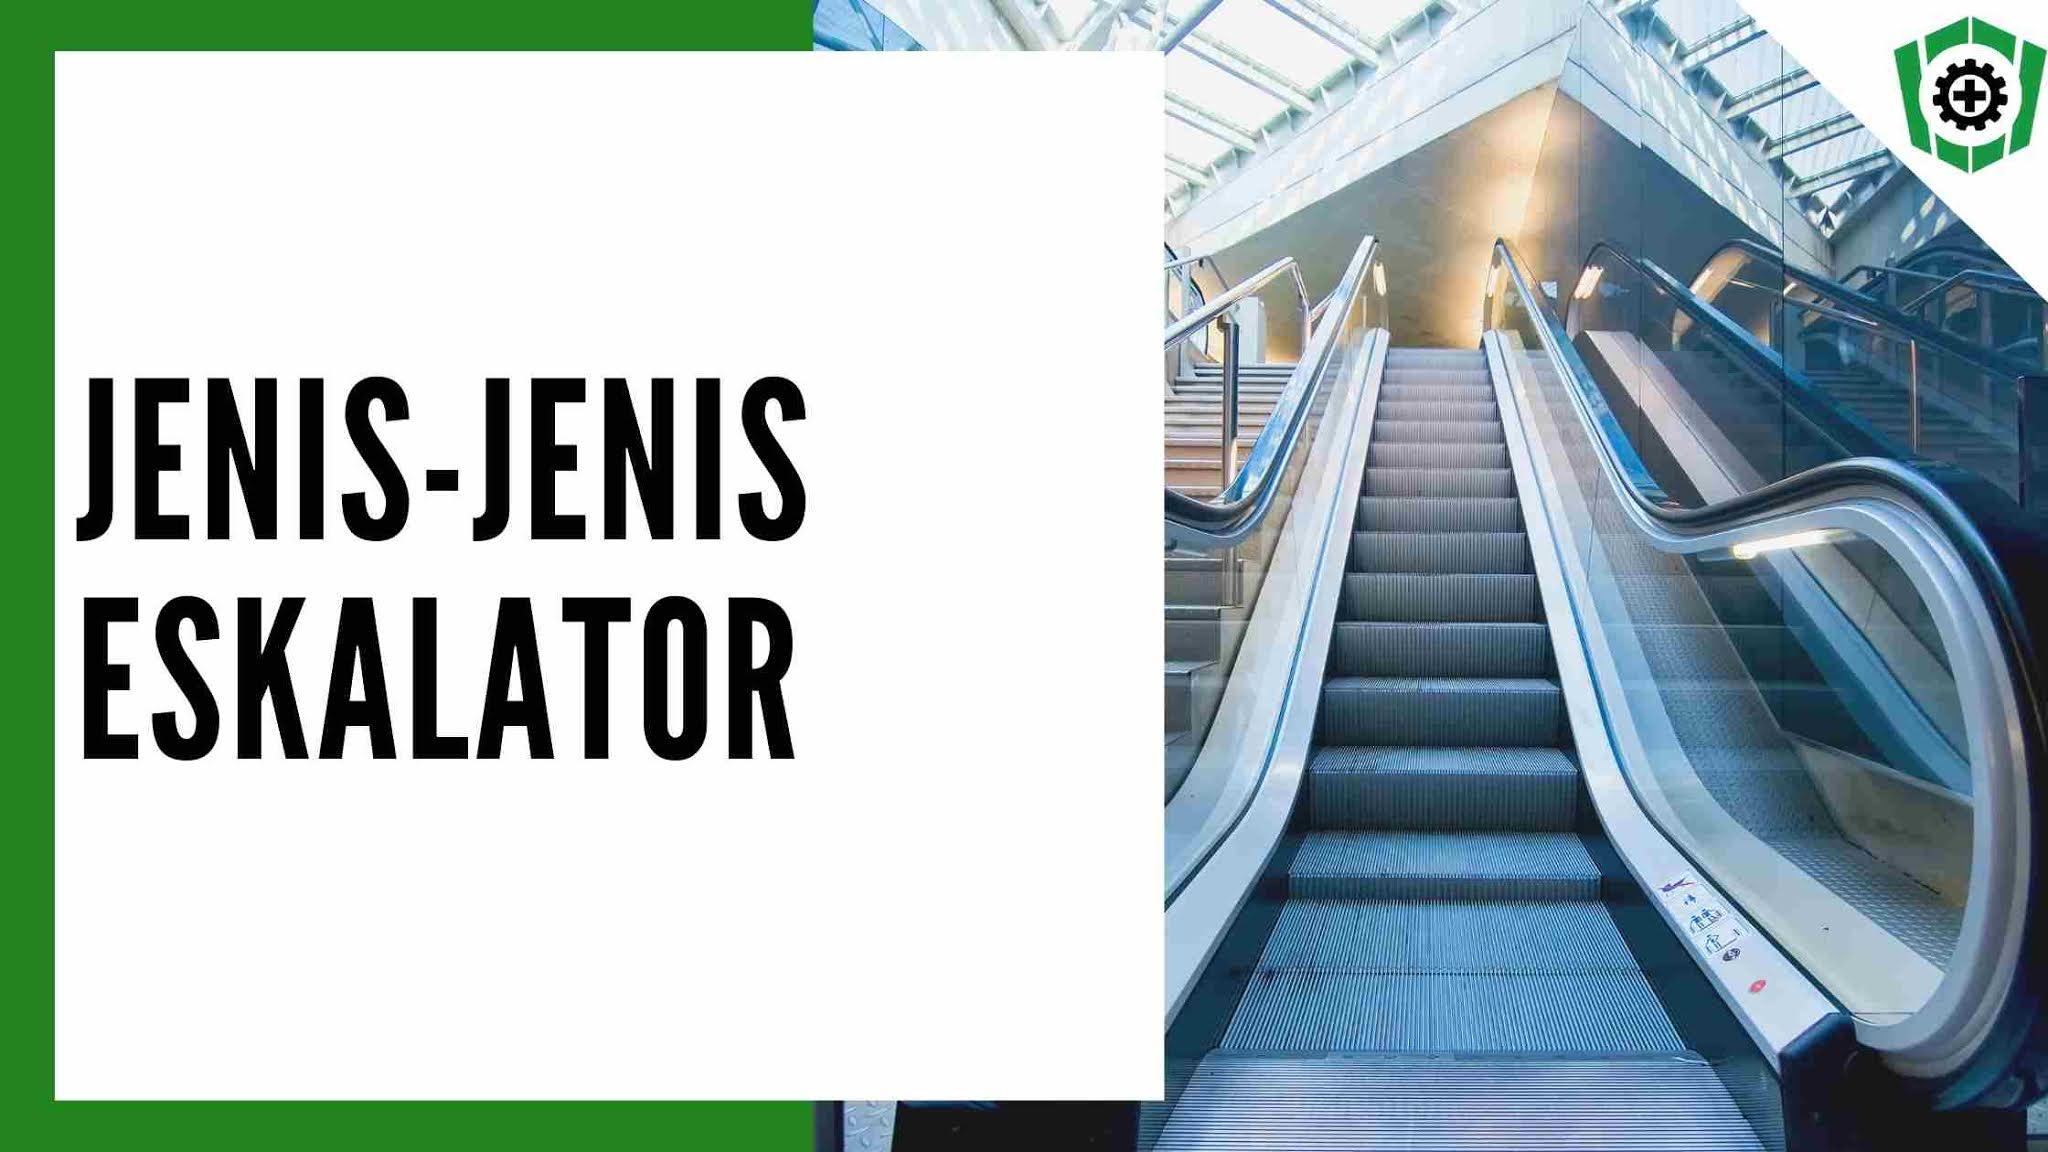 Jenis jenis eskalator